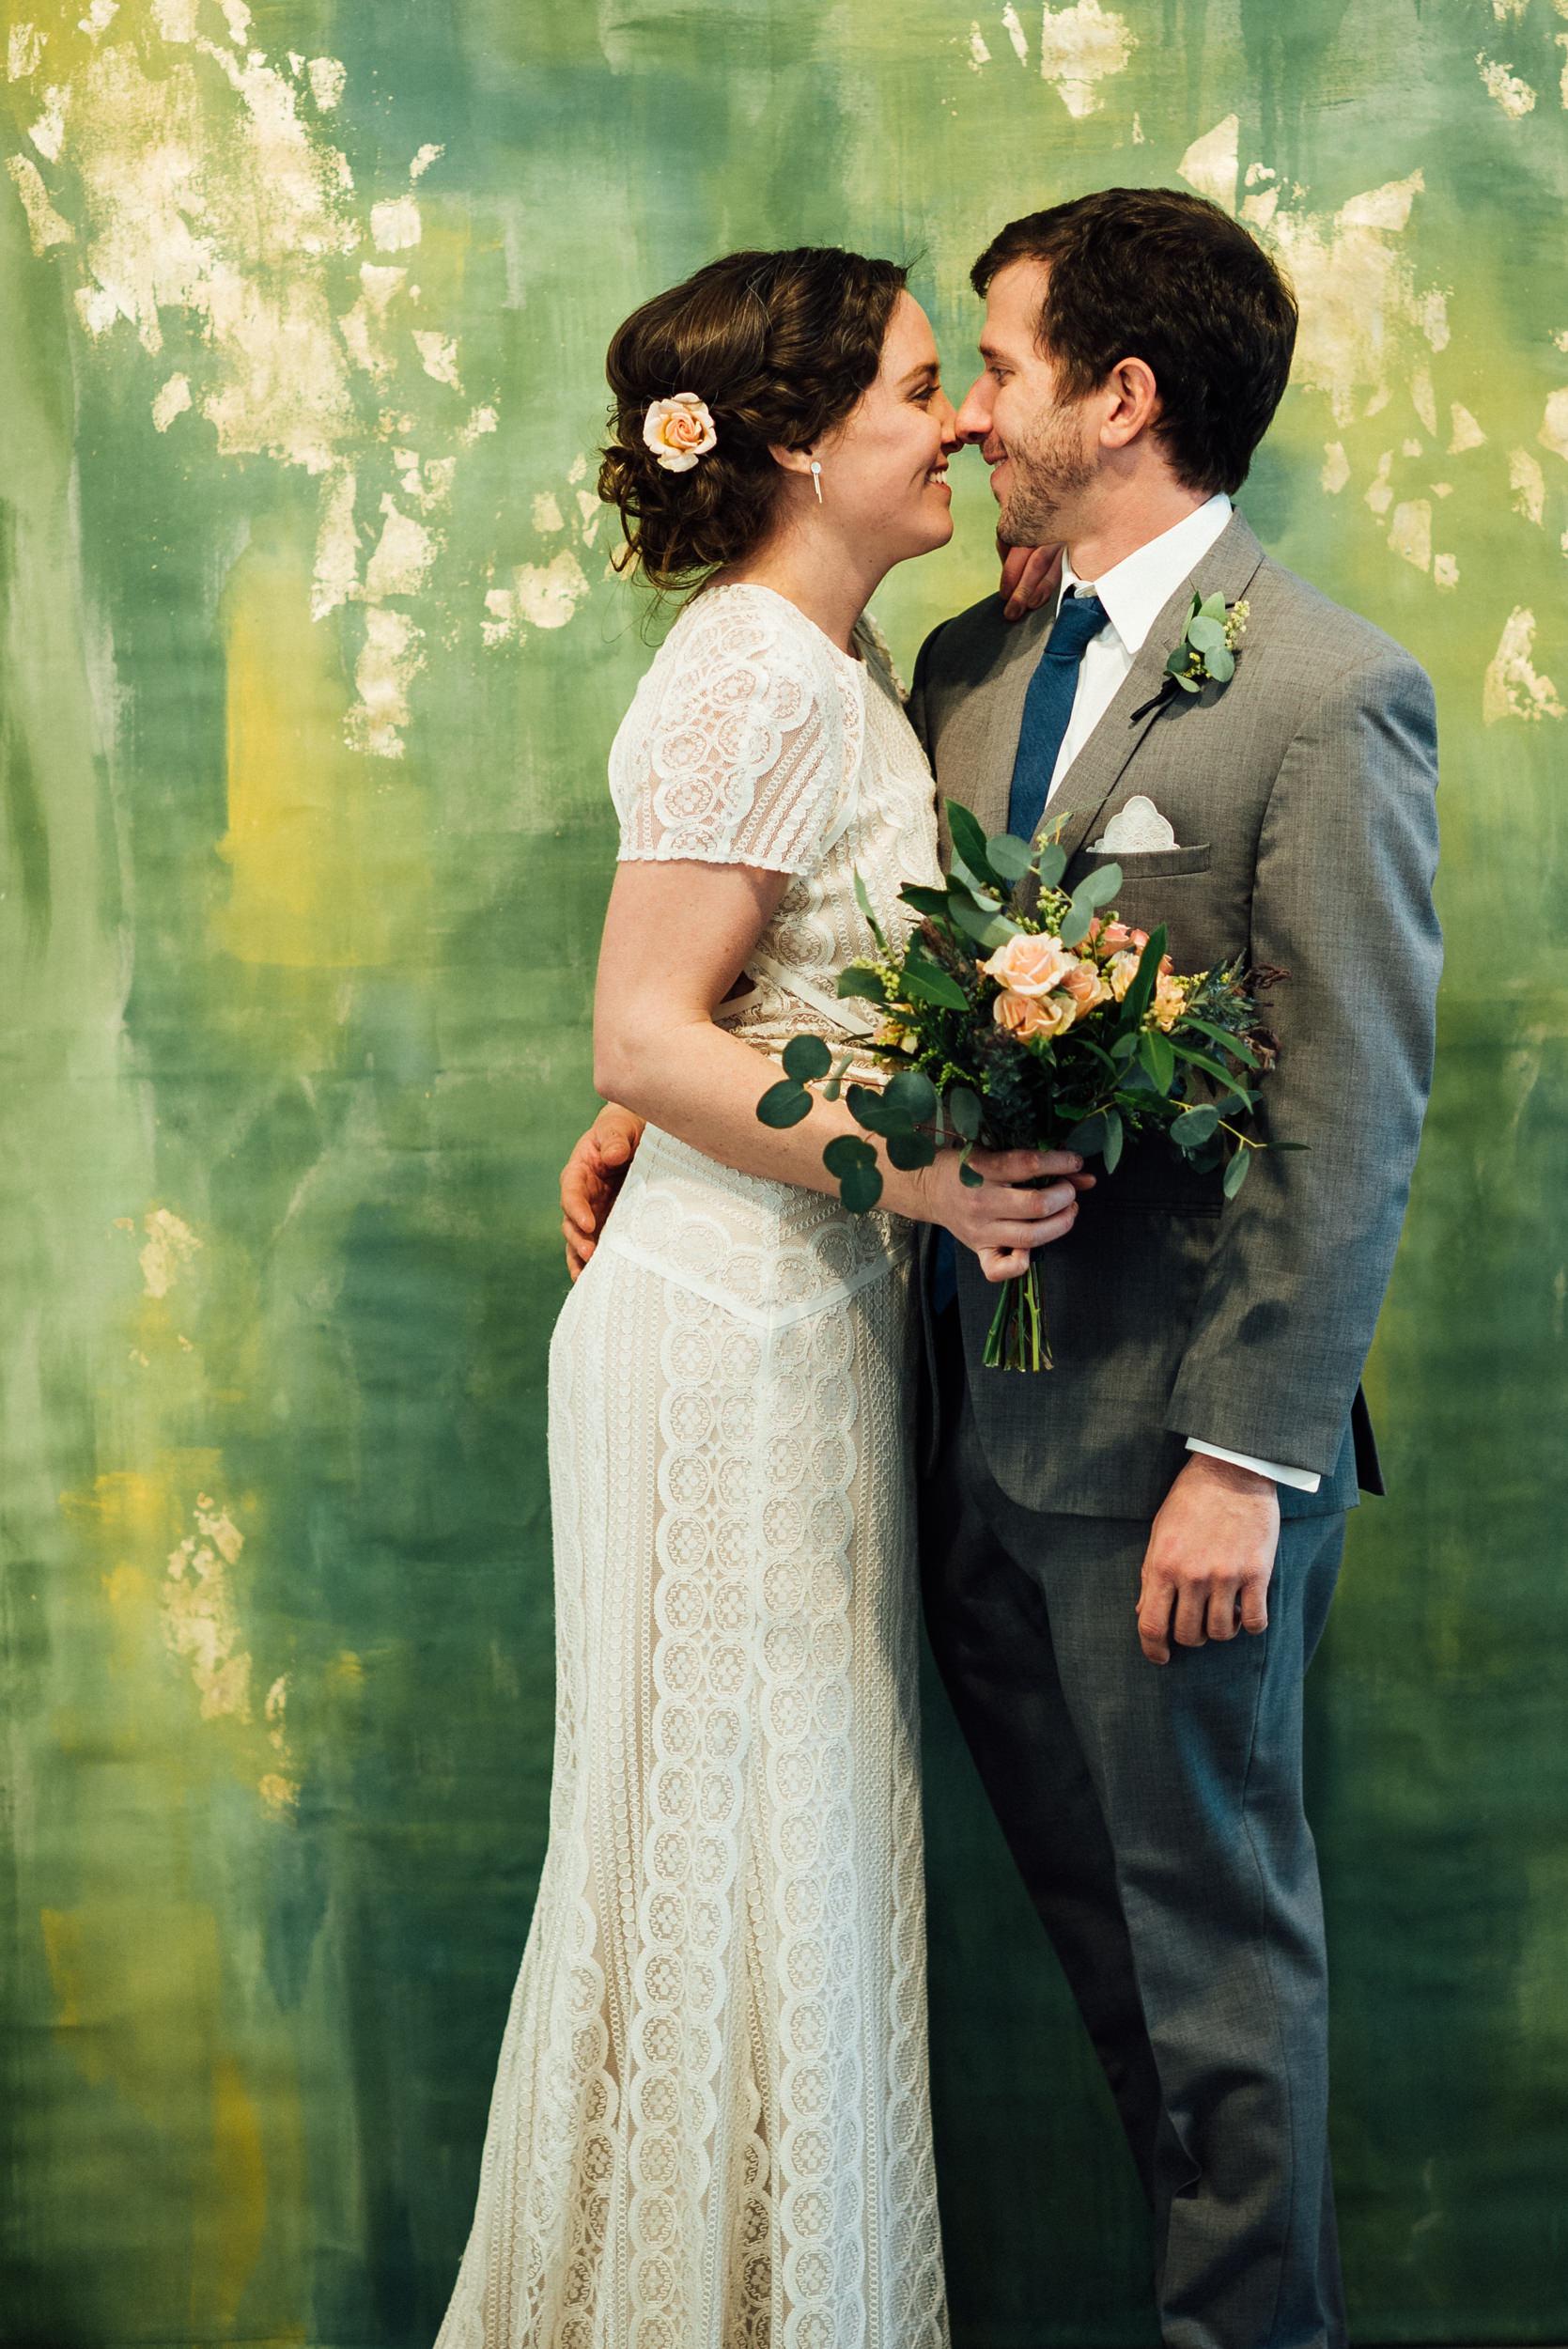 Space Gallery wedding photographer